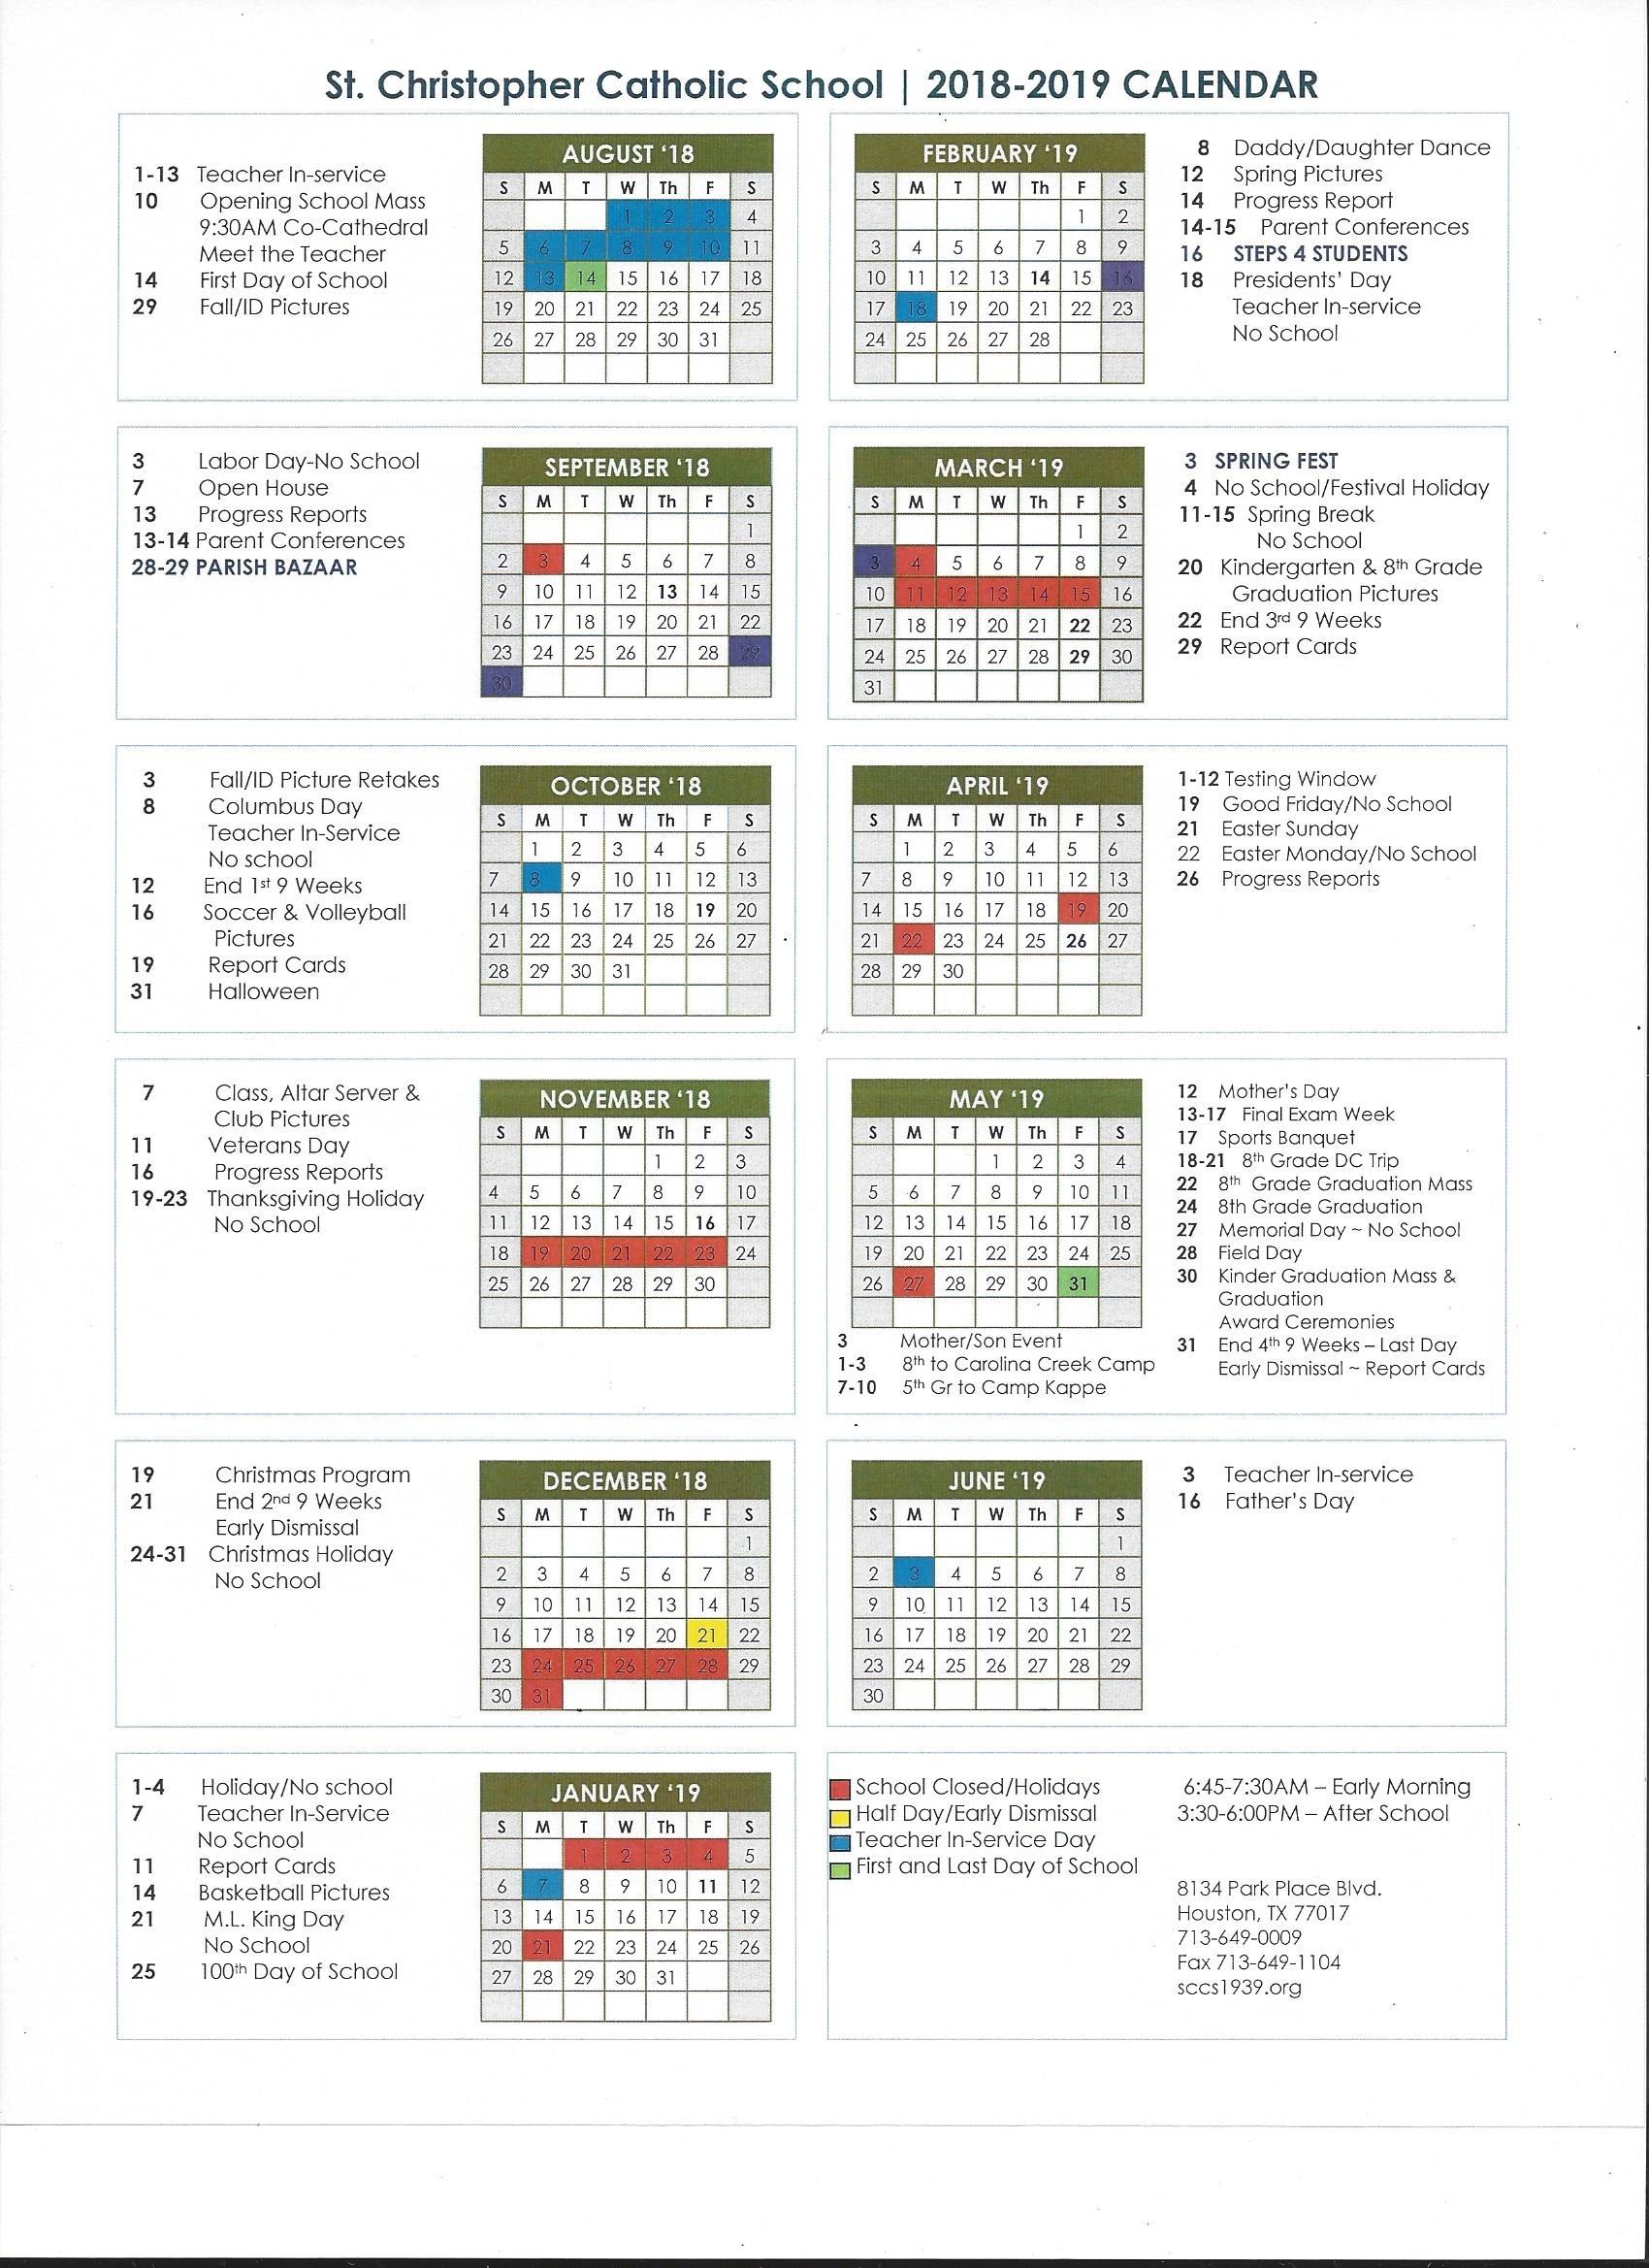 Calendar : St. Christopher Catholic School